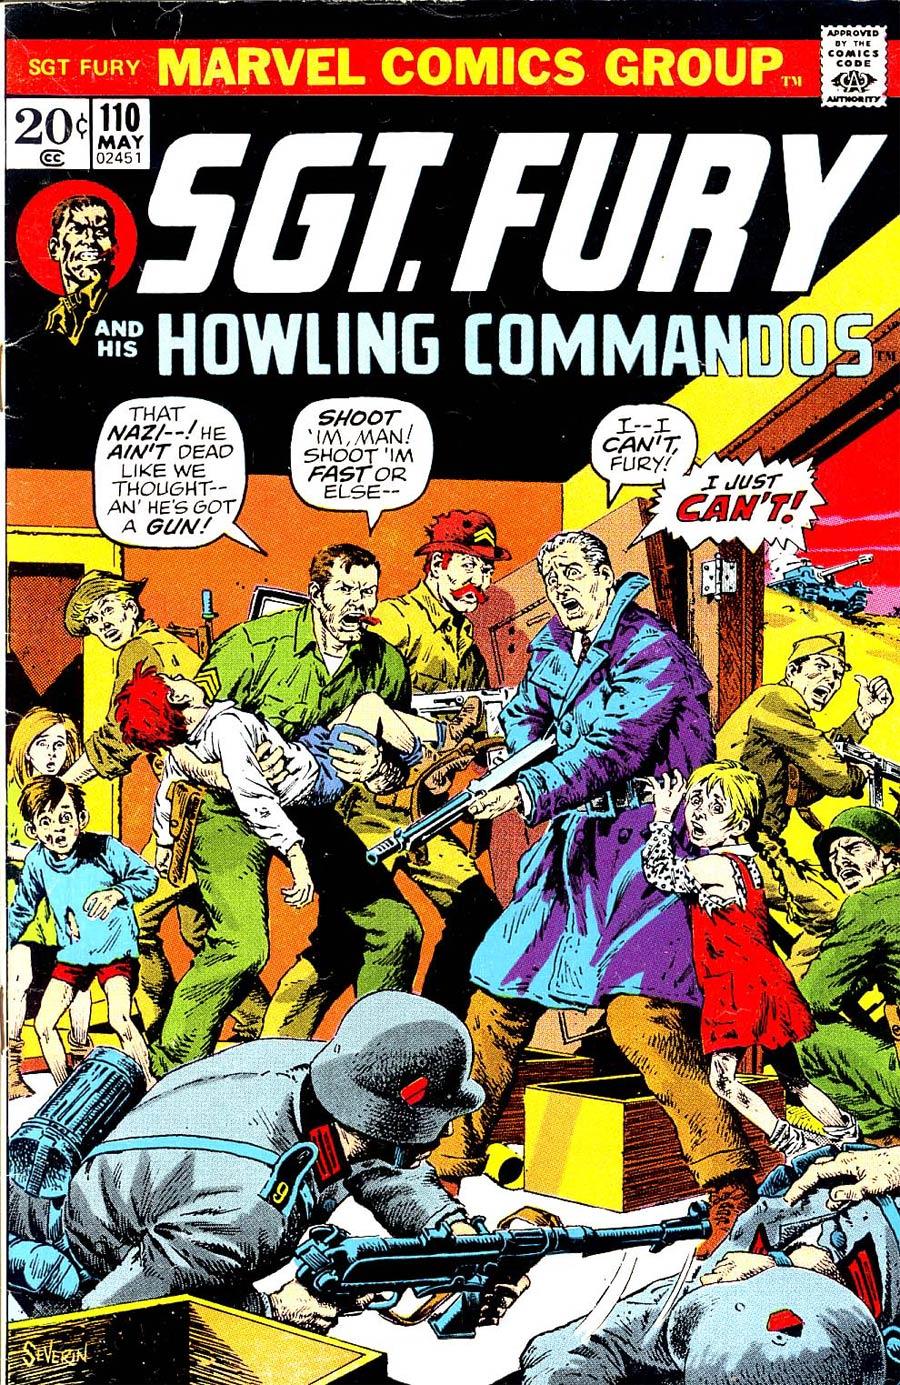 Sgt. Fury & His Howling Commandos #110